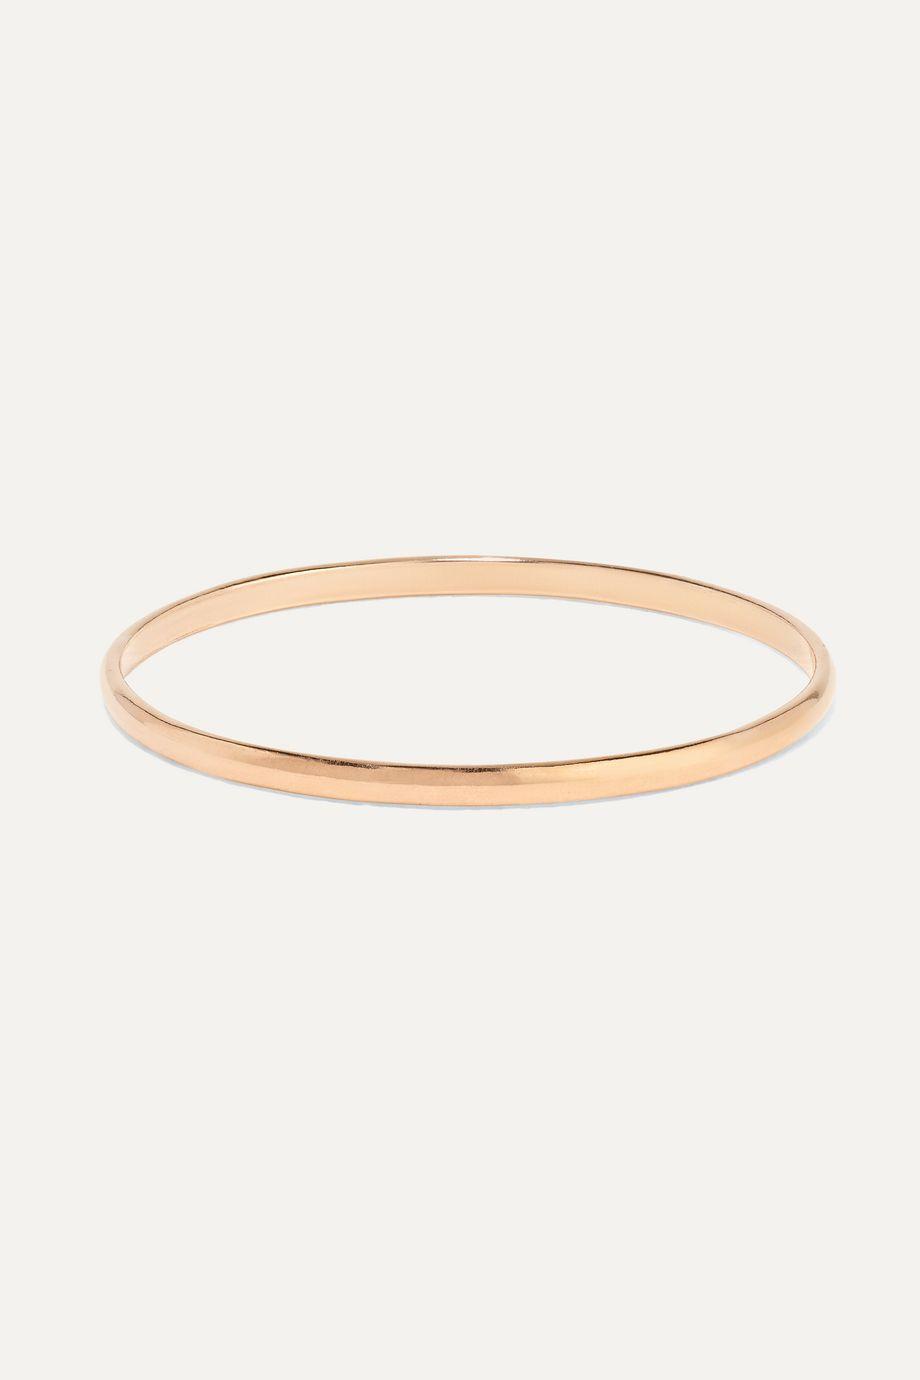 Catbird + NET SUSTAIN Mignon Memory 14-karat rose gold ring